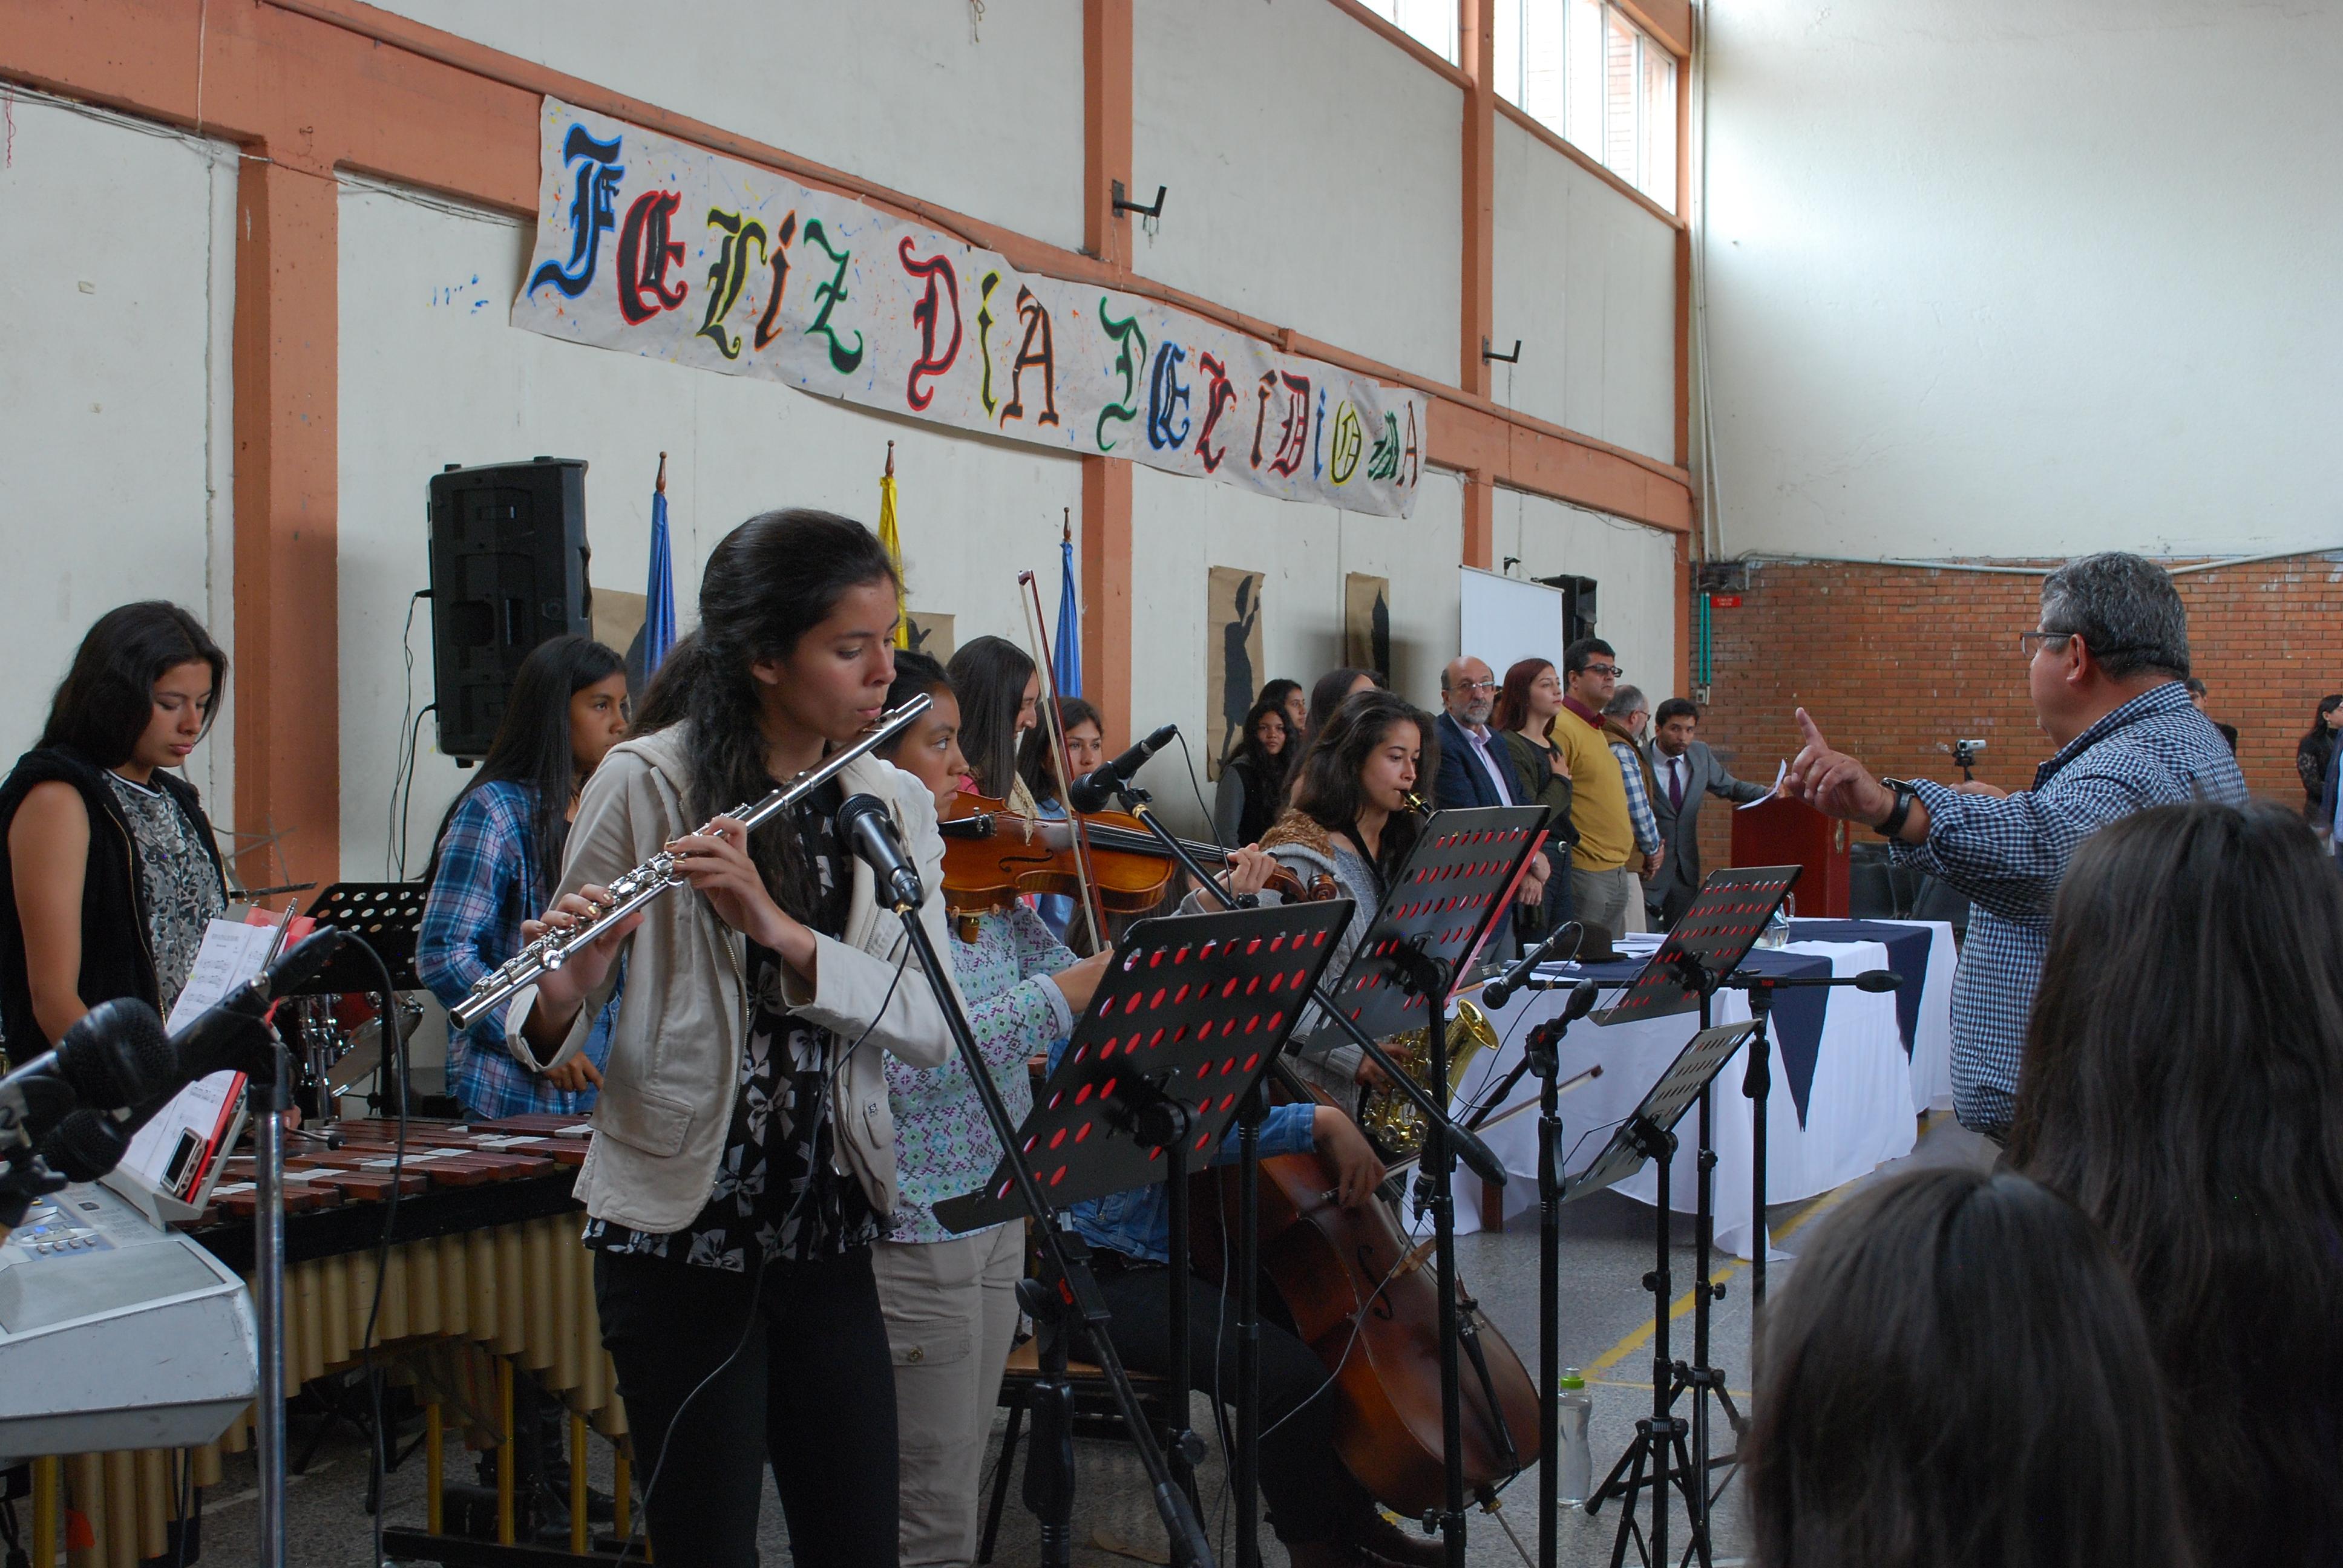 La orquesta actual